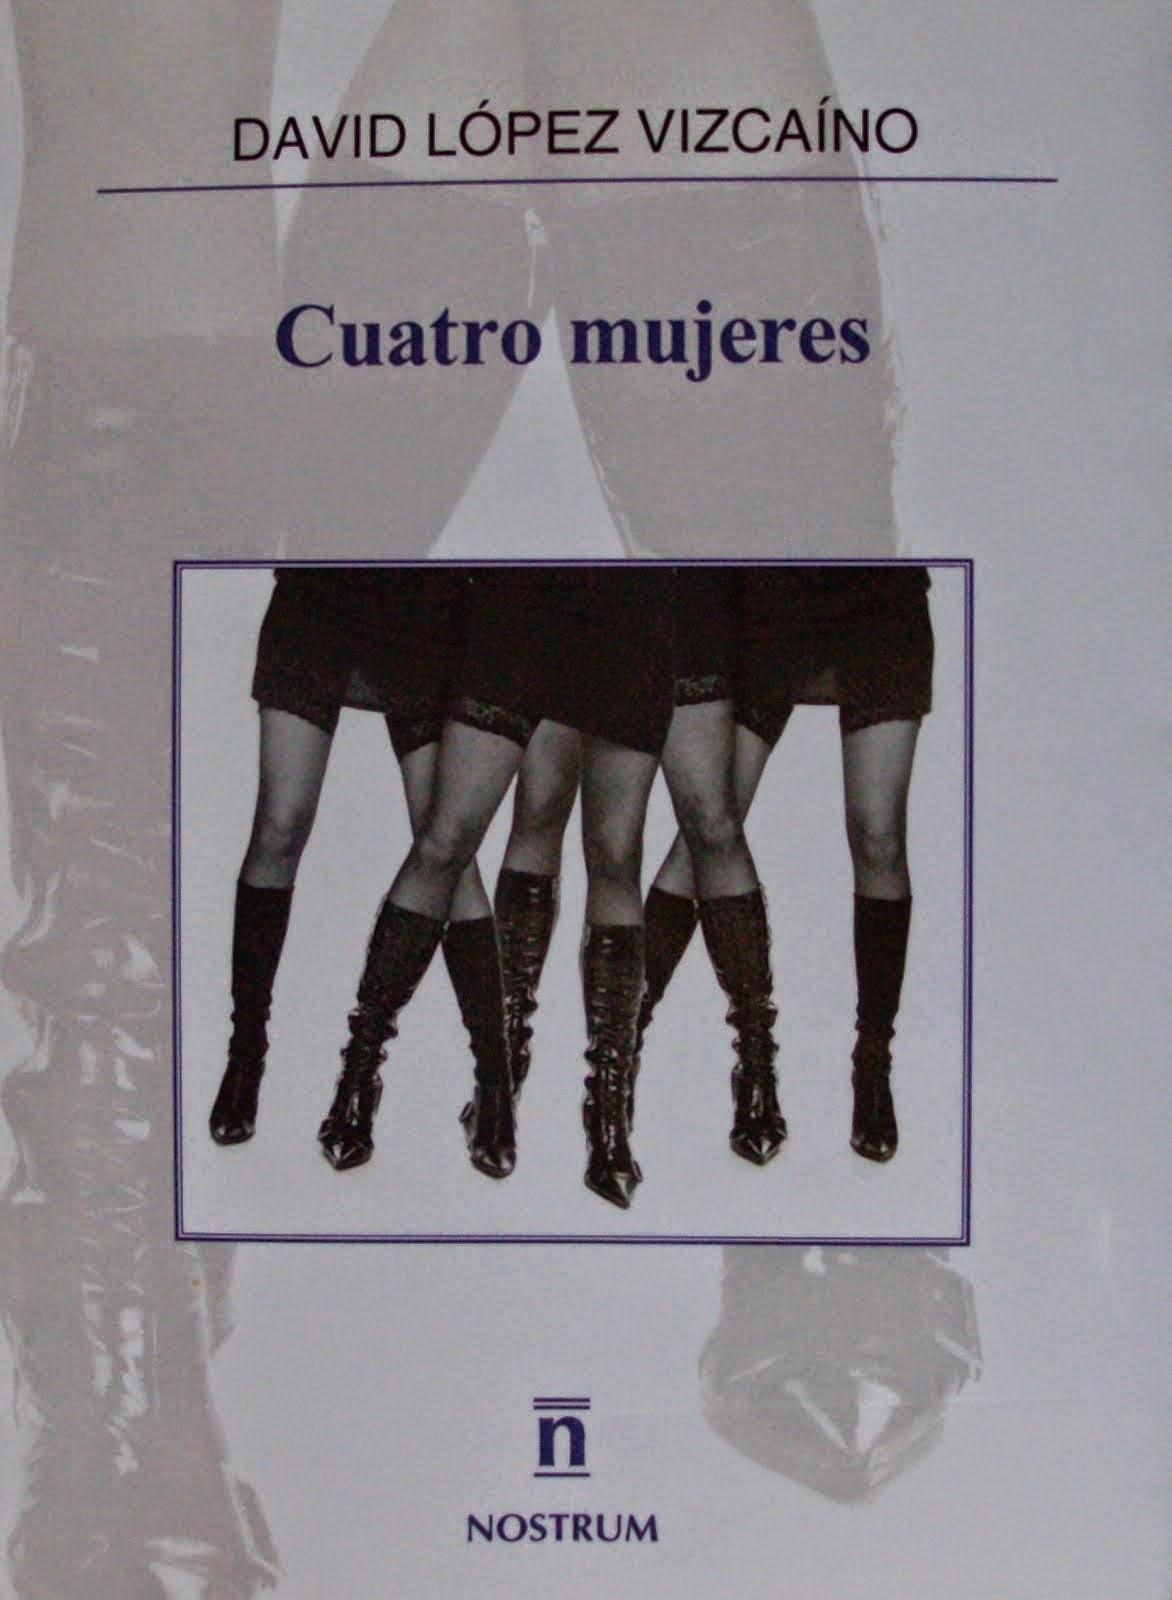 Obra del bloguero. Autor. Novela. Cuatro mujeres, 2014